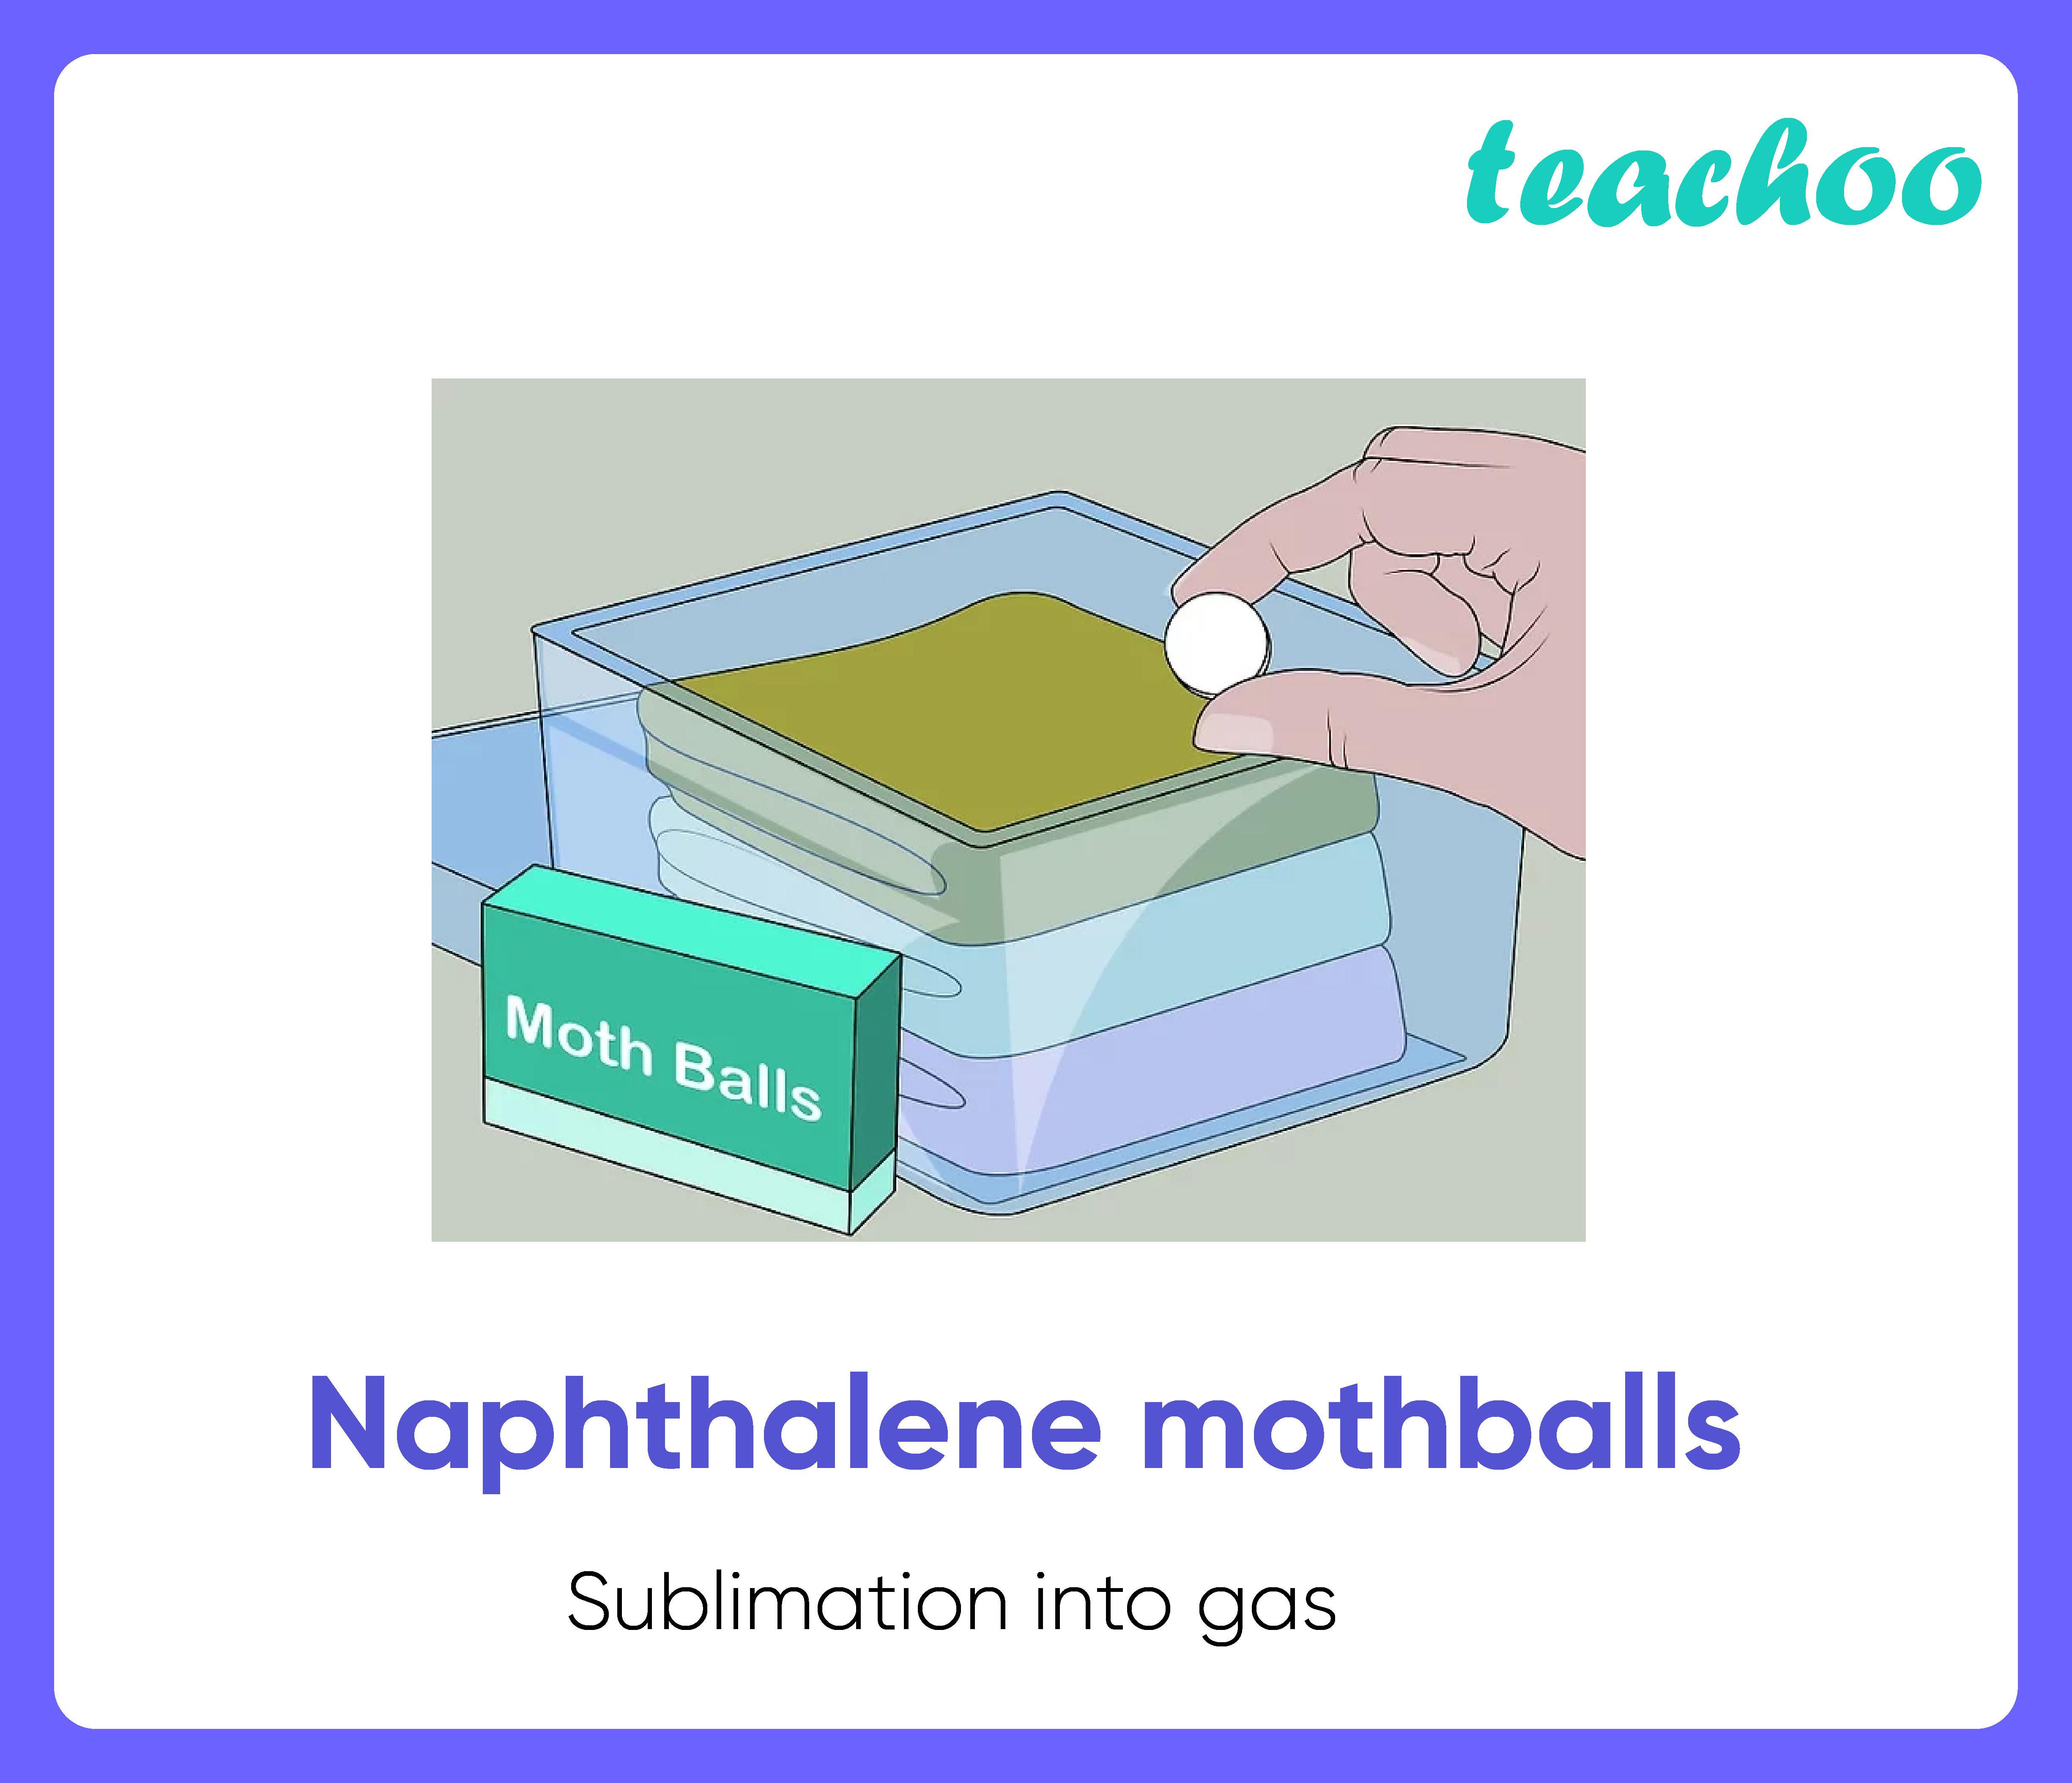 Naphthalene mothballs-Teachoo-01.png